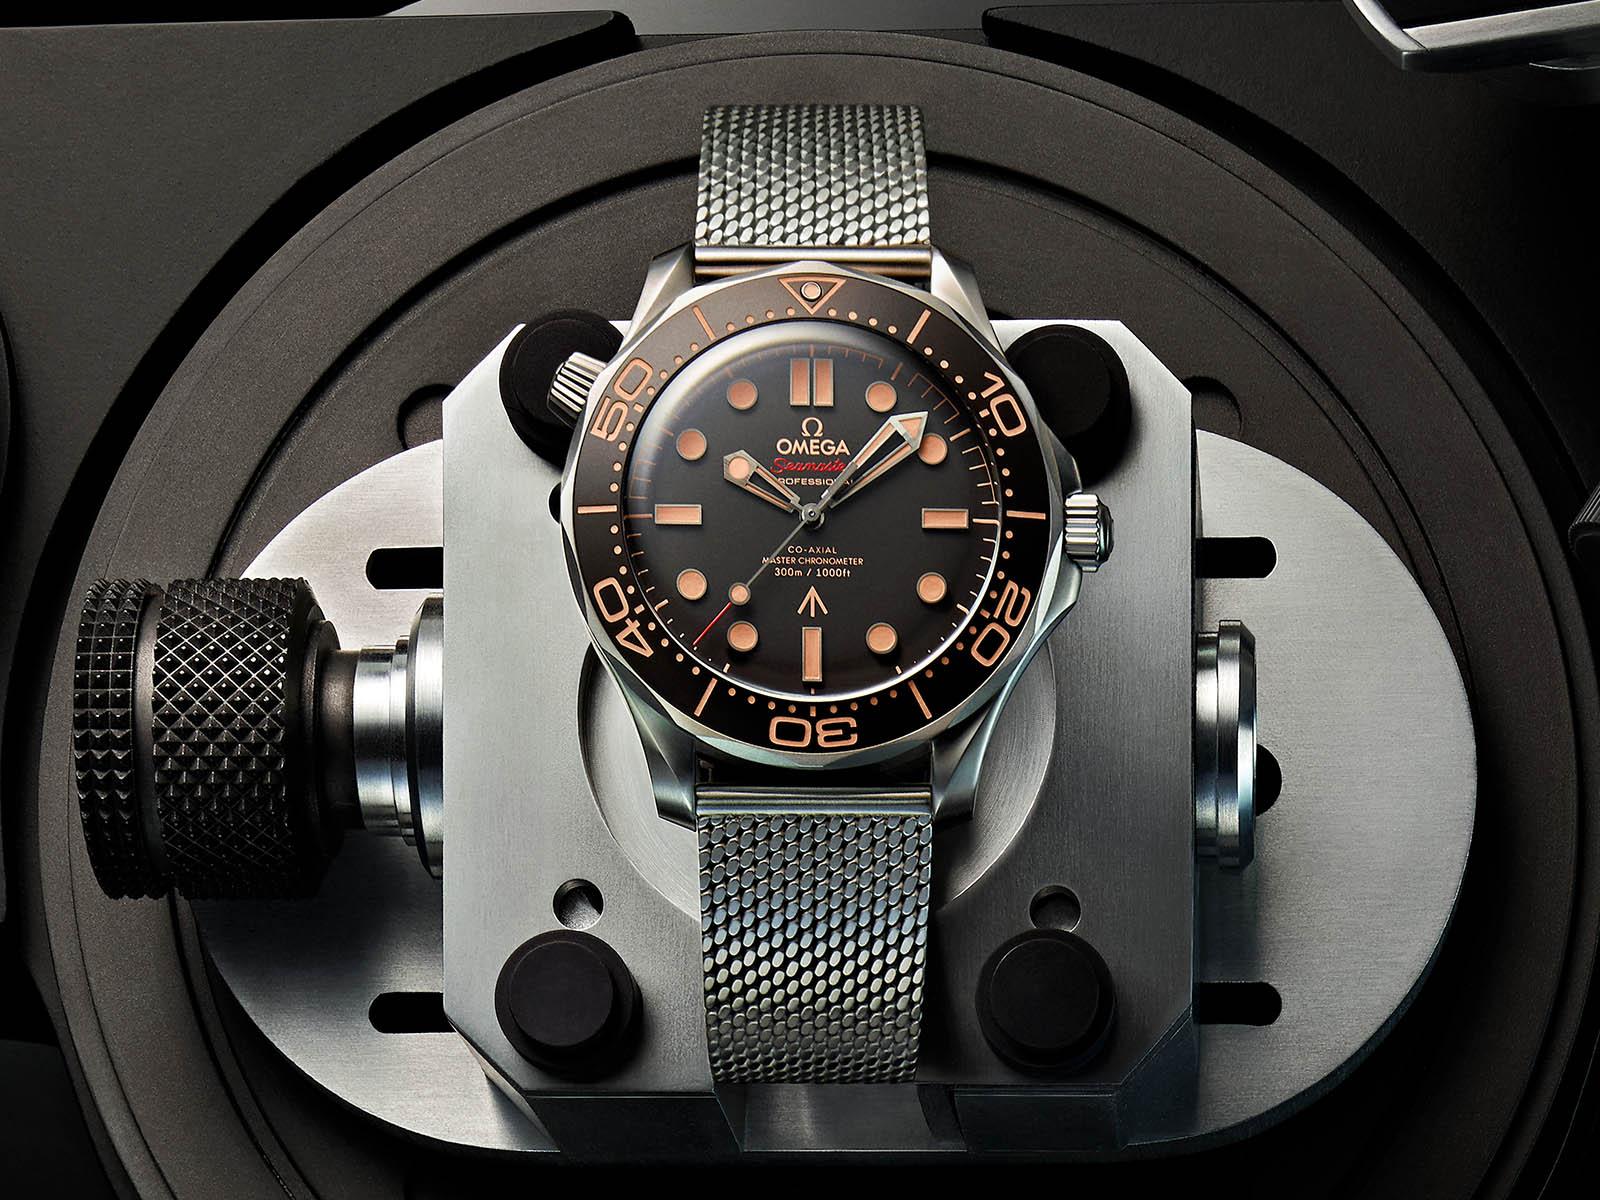 210-90-42-20-01-001-omega-seamaster-diver-300m-007-edition-2.jpg